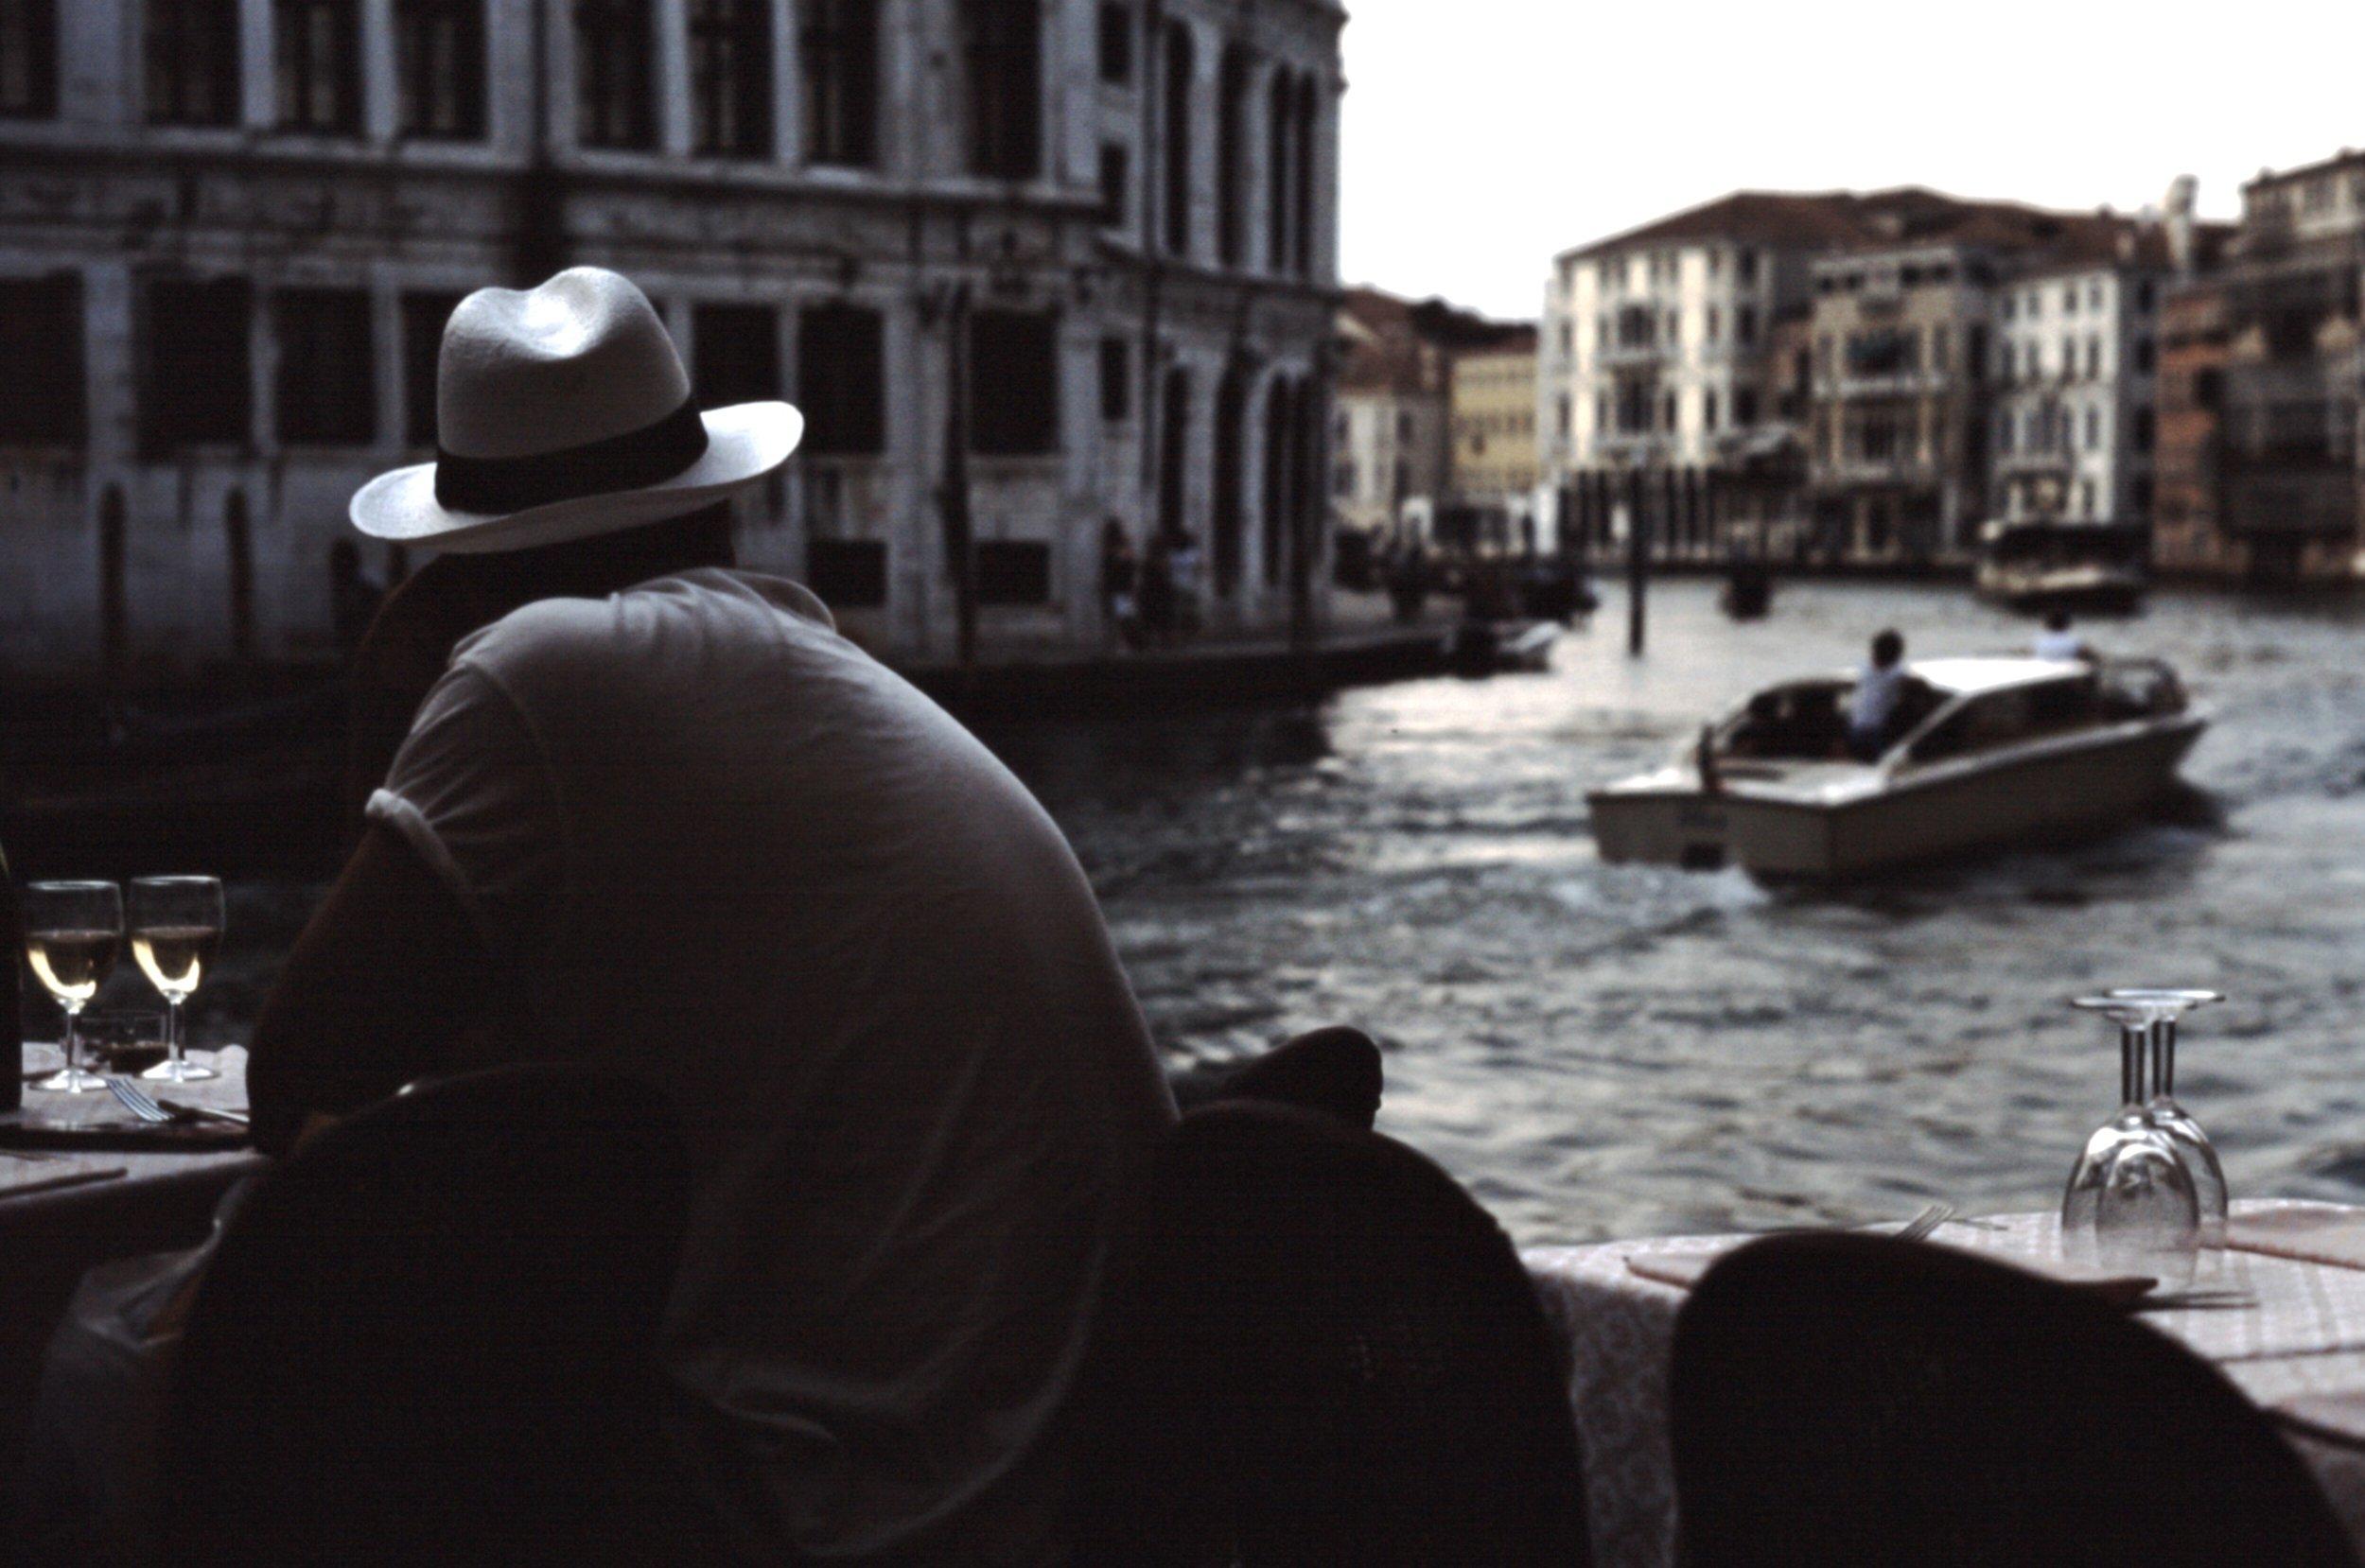 074_Venice.jpg